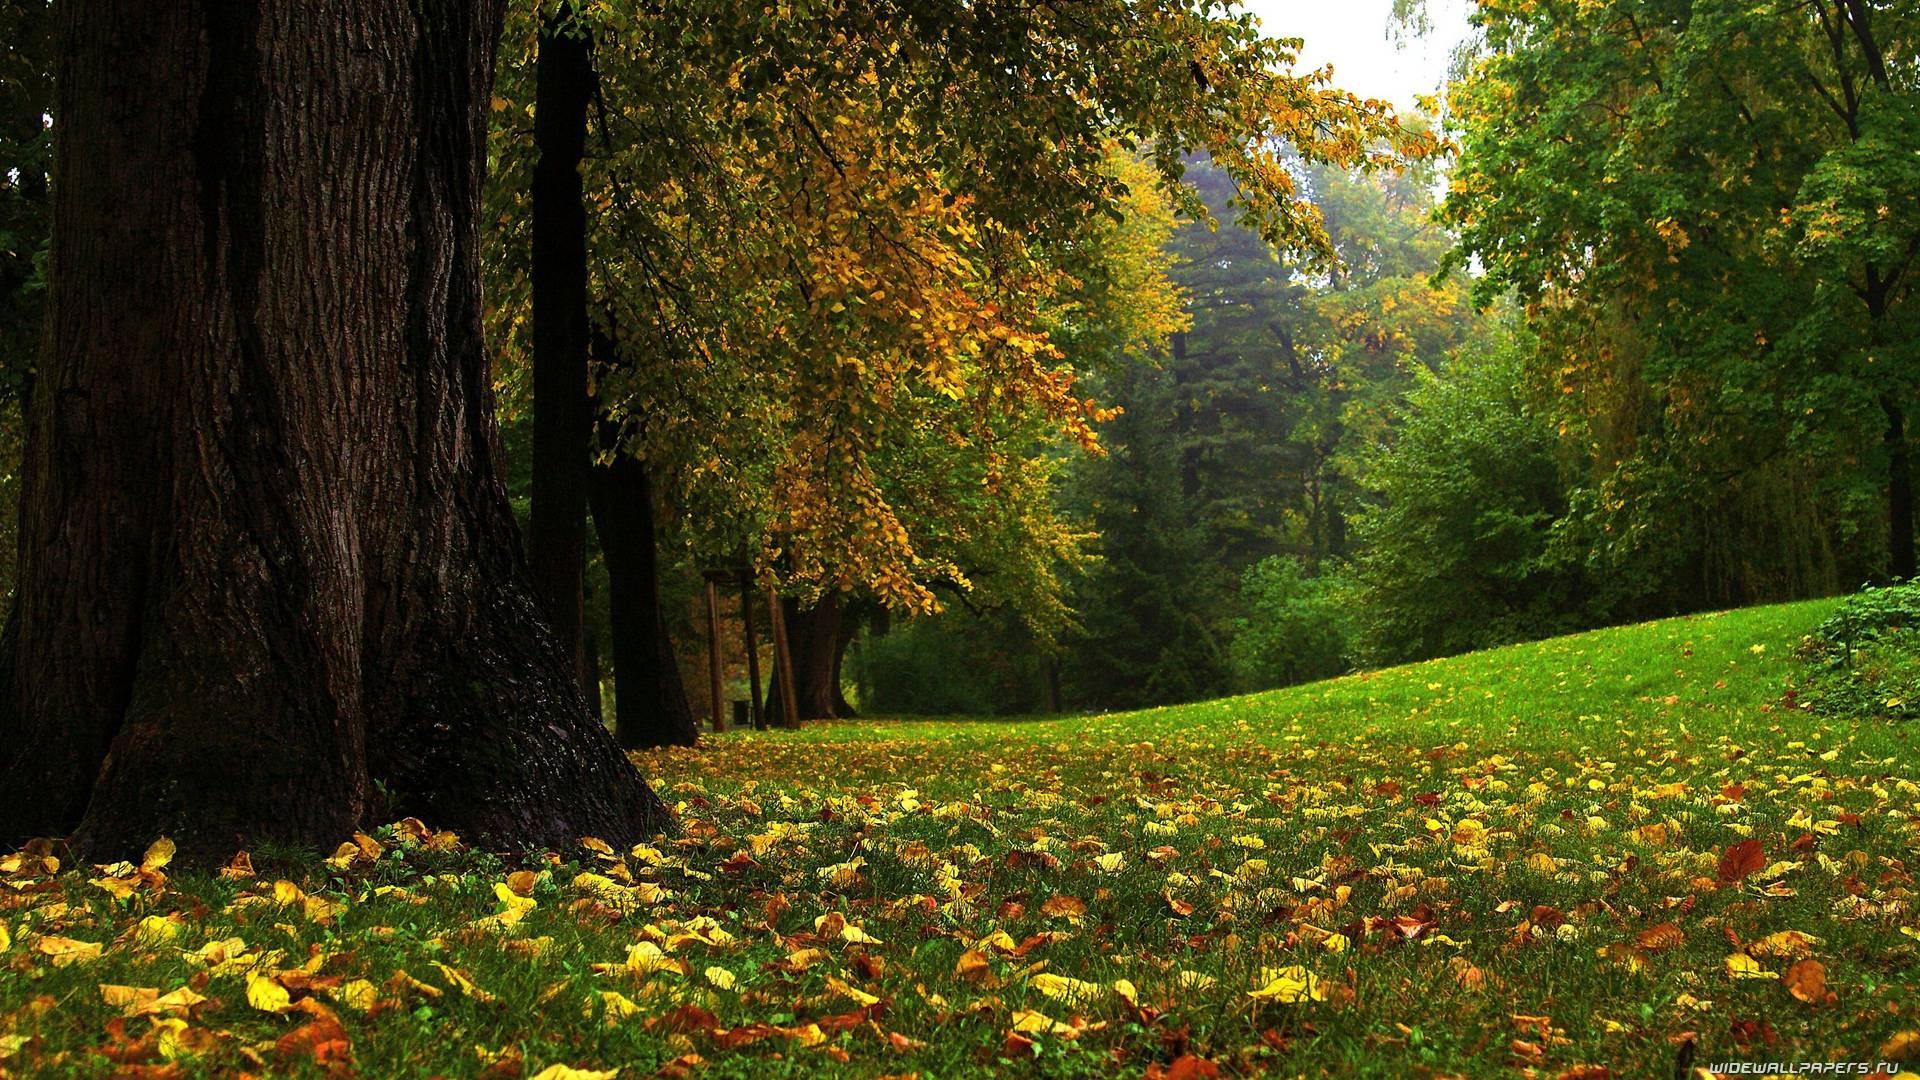 Autumn Backgrounds Desktop 1920x1080